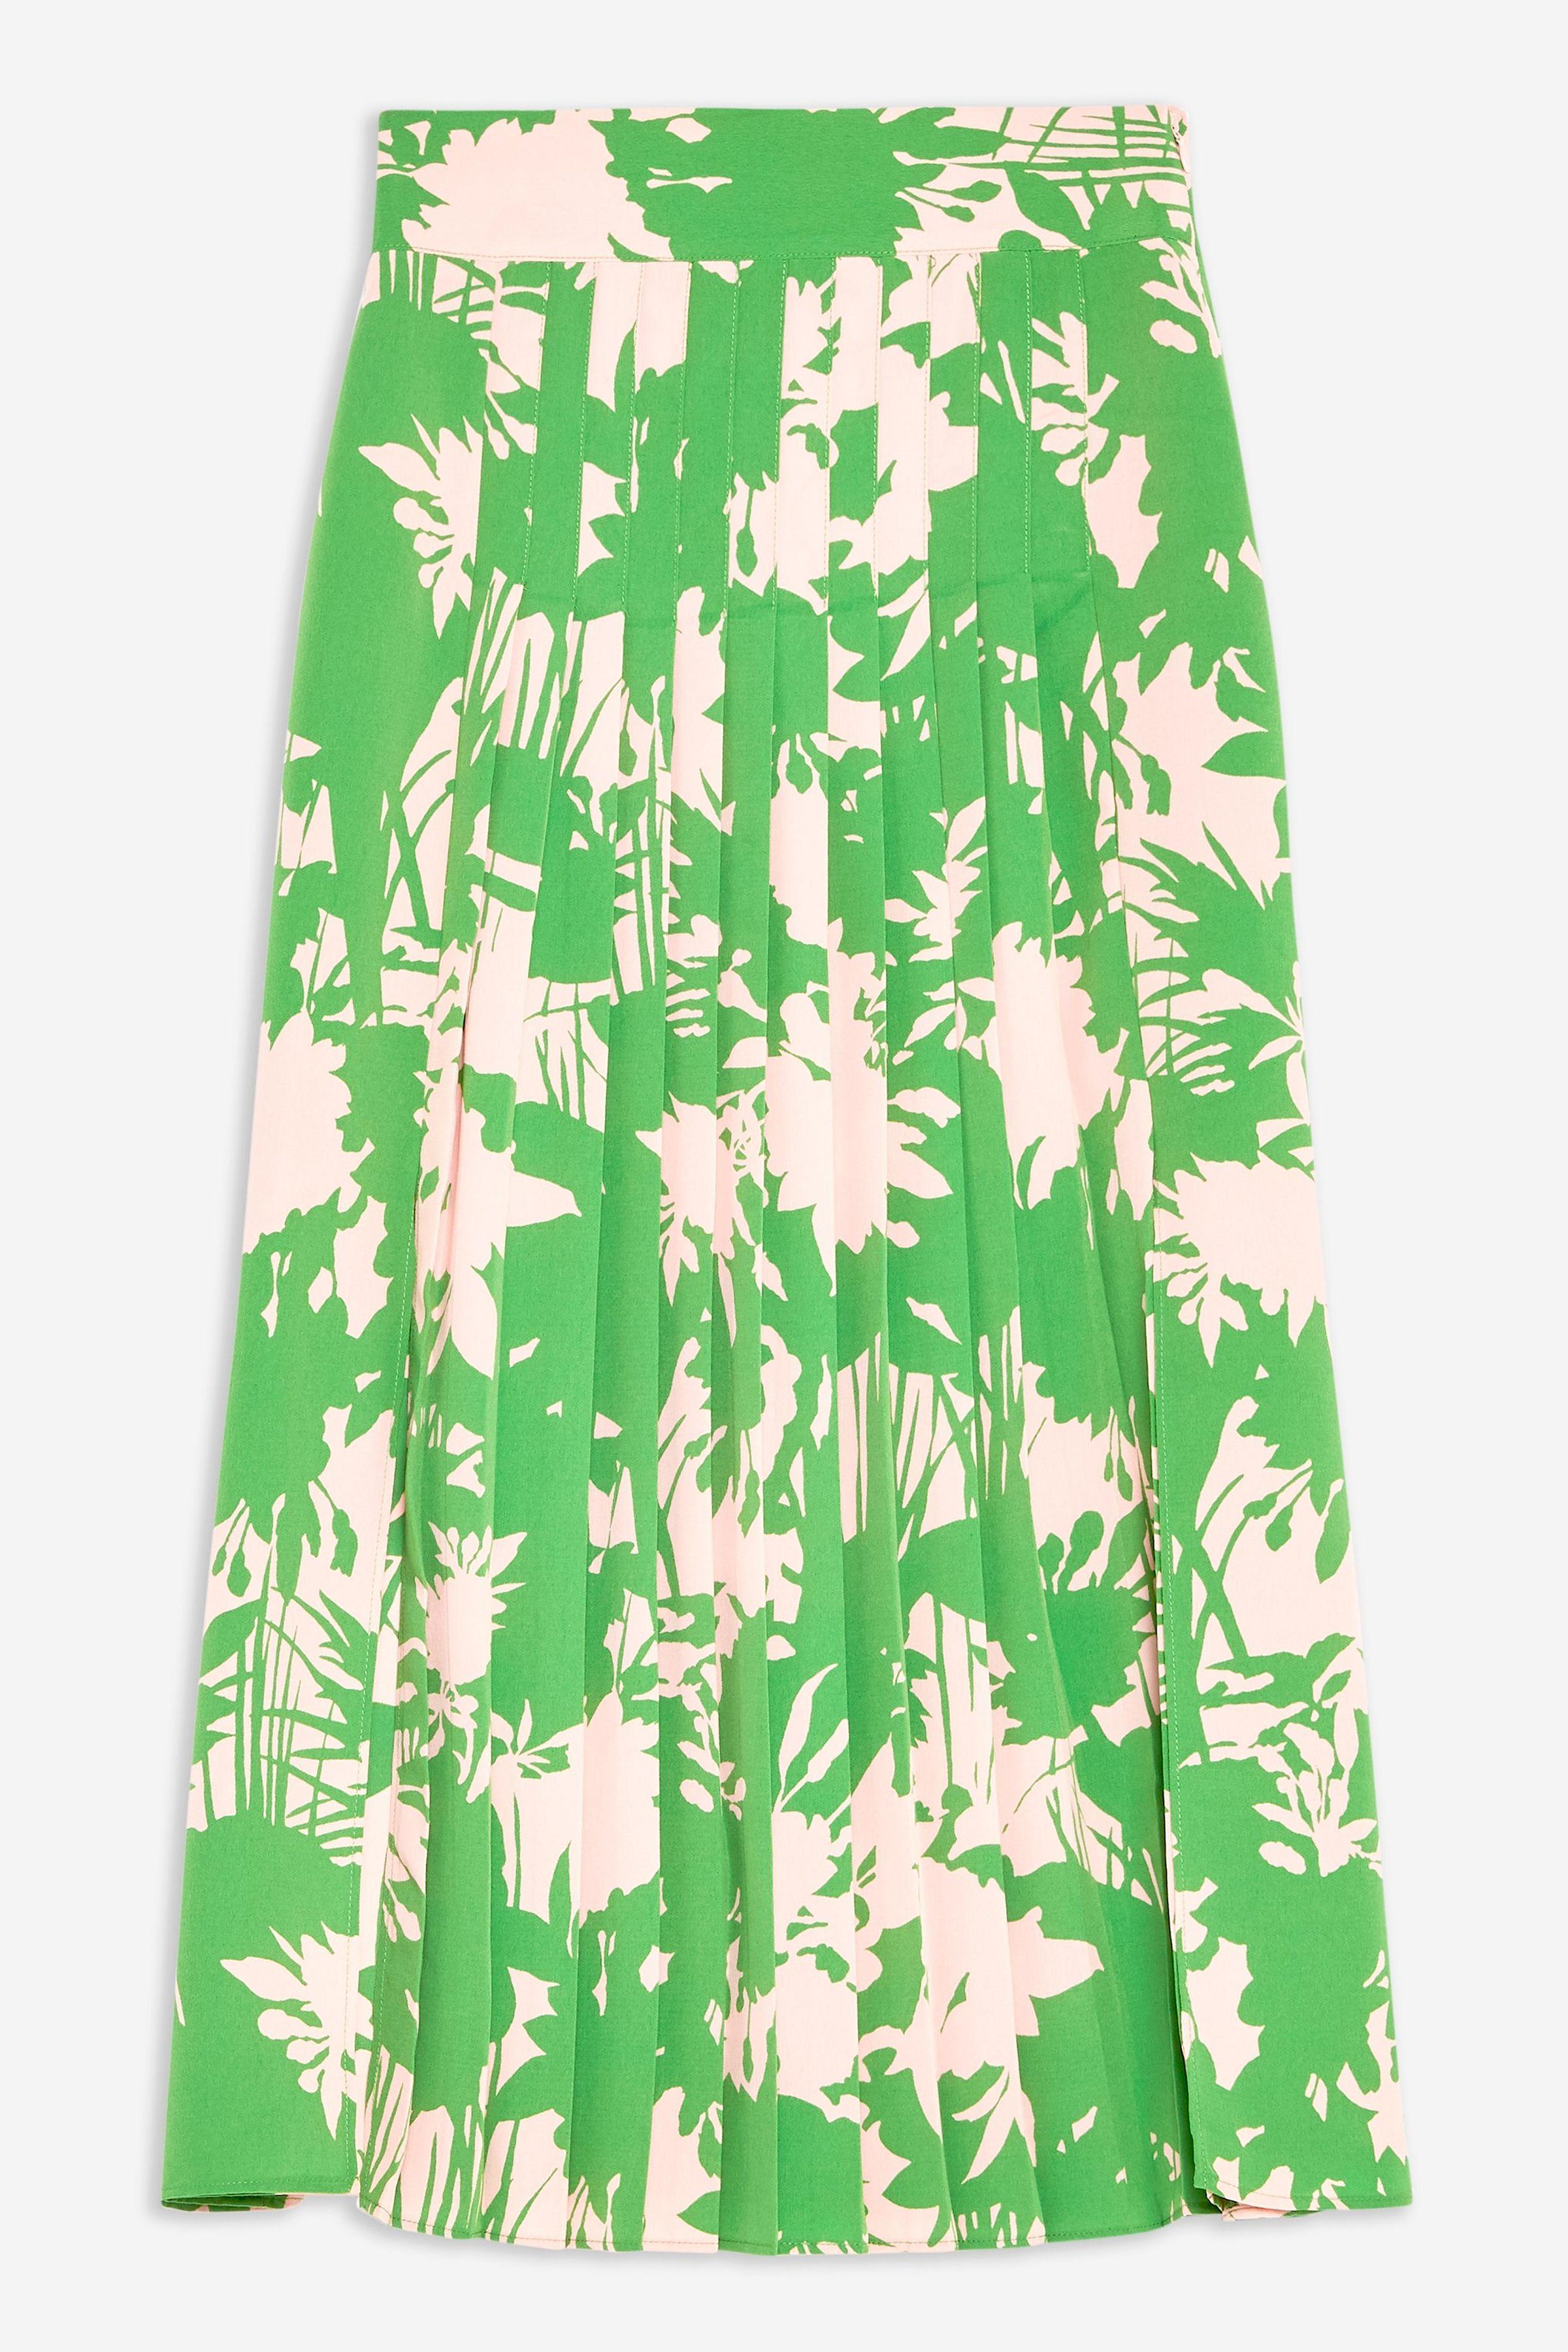 https://www.topshop.com/en/tsuk/product/abstract-floral-pleat-midi-skirt-8615548